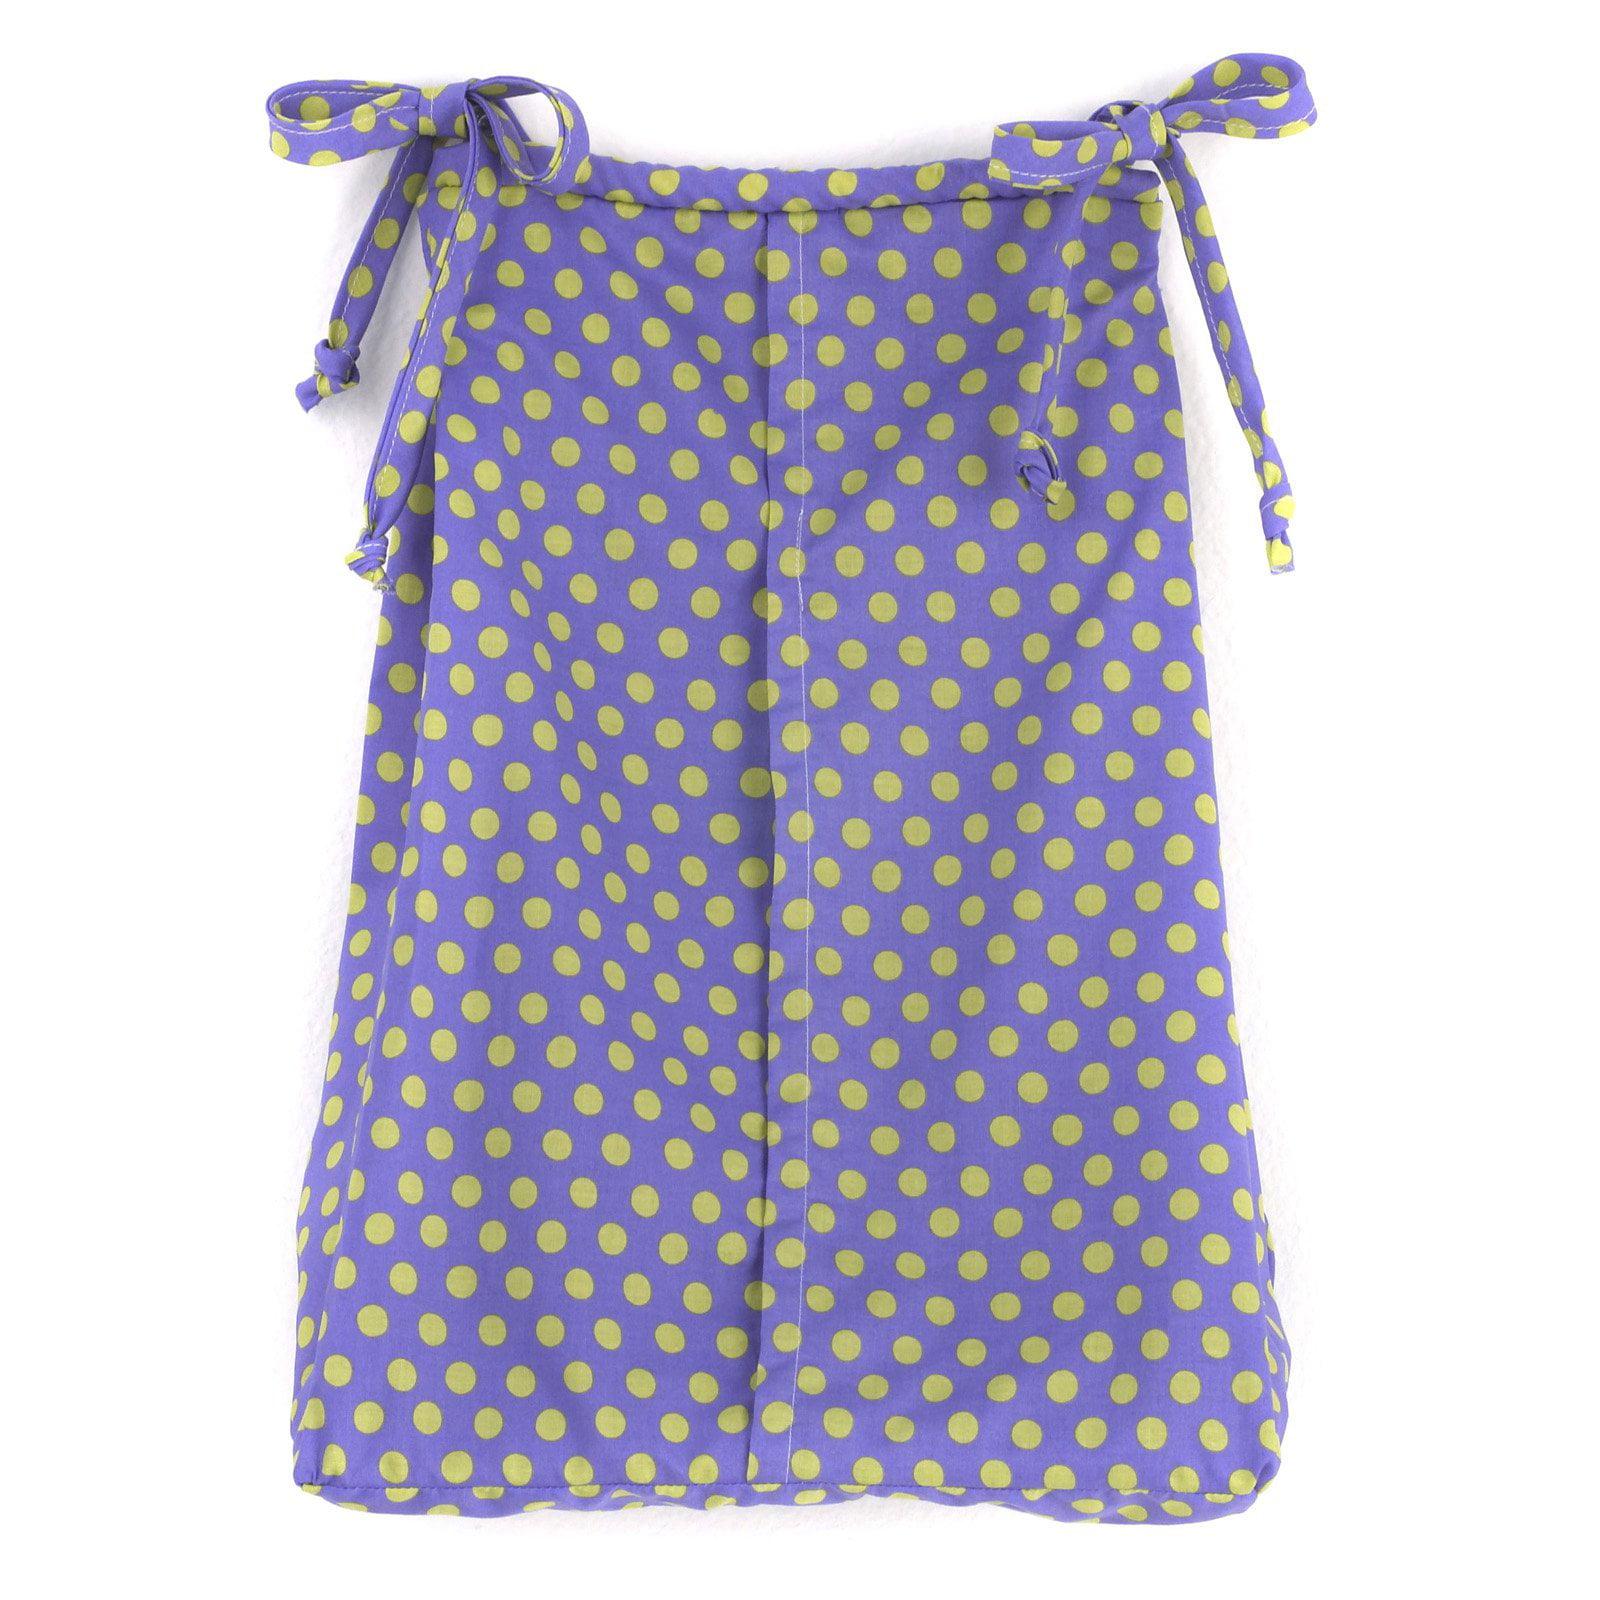 Cotton Tale Designs Periwinkle Diaper Stacker by Cotton Tale Designs